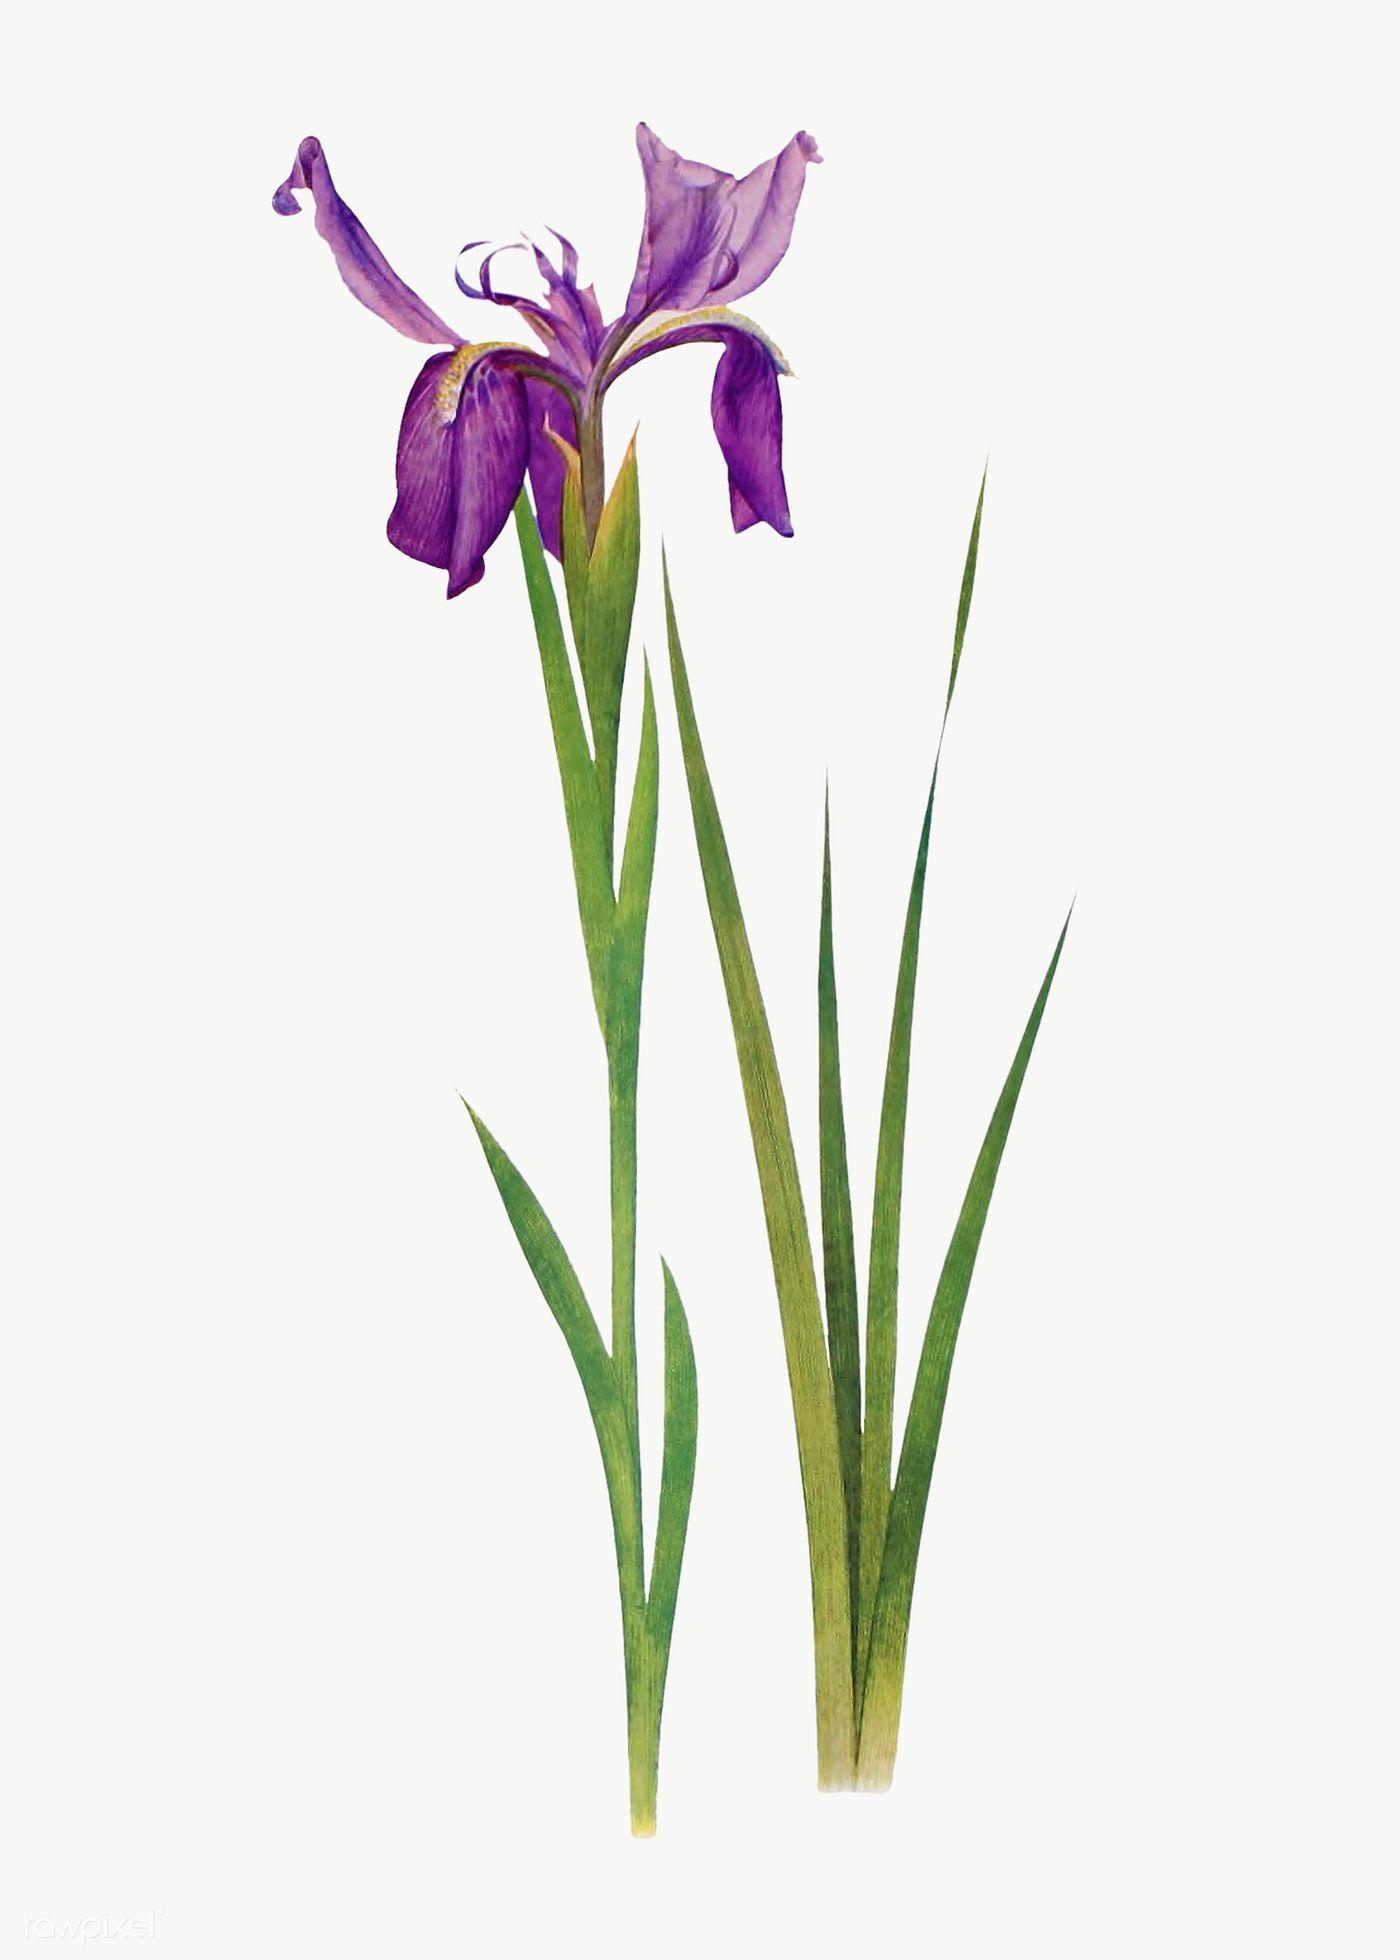 Download Premium Png Of Vintage Iris Flower Illustration Transparent Png In 2020 Flower Illustration Iris Flowers Flower Drawing